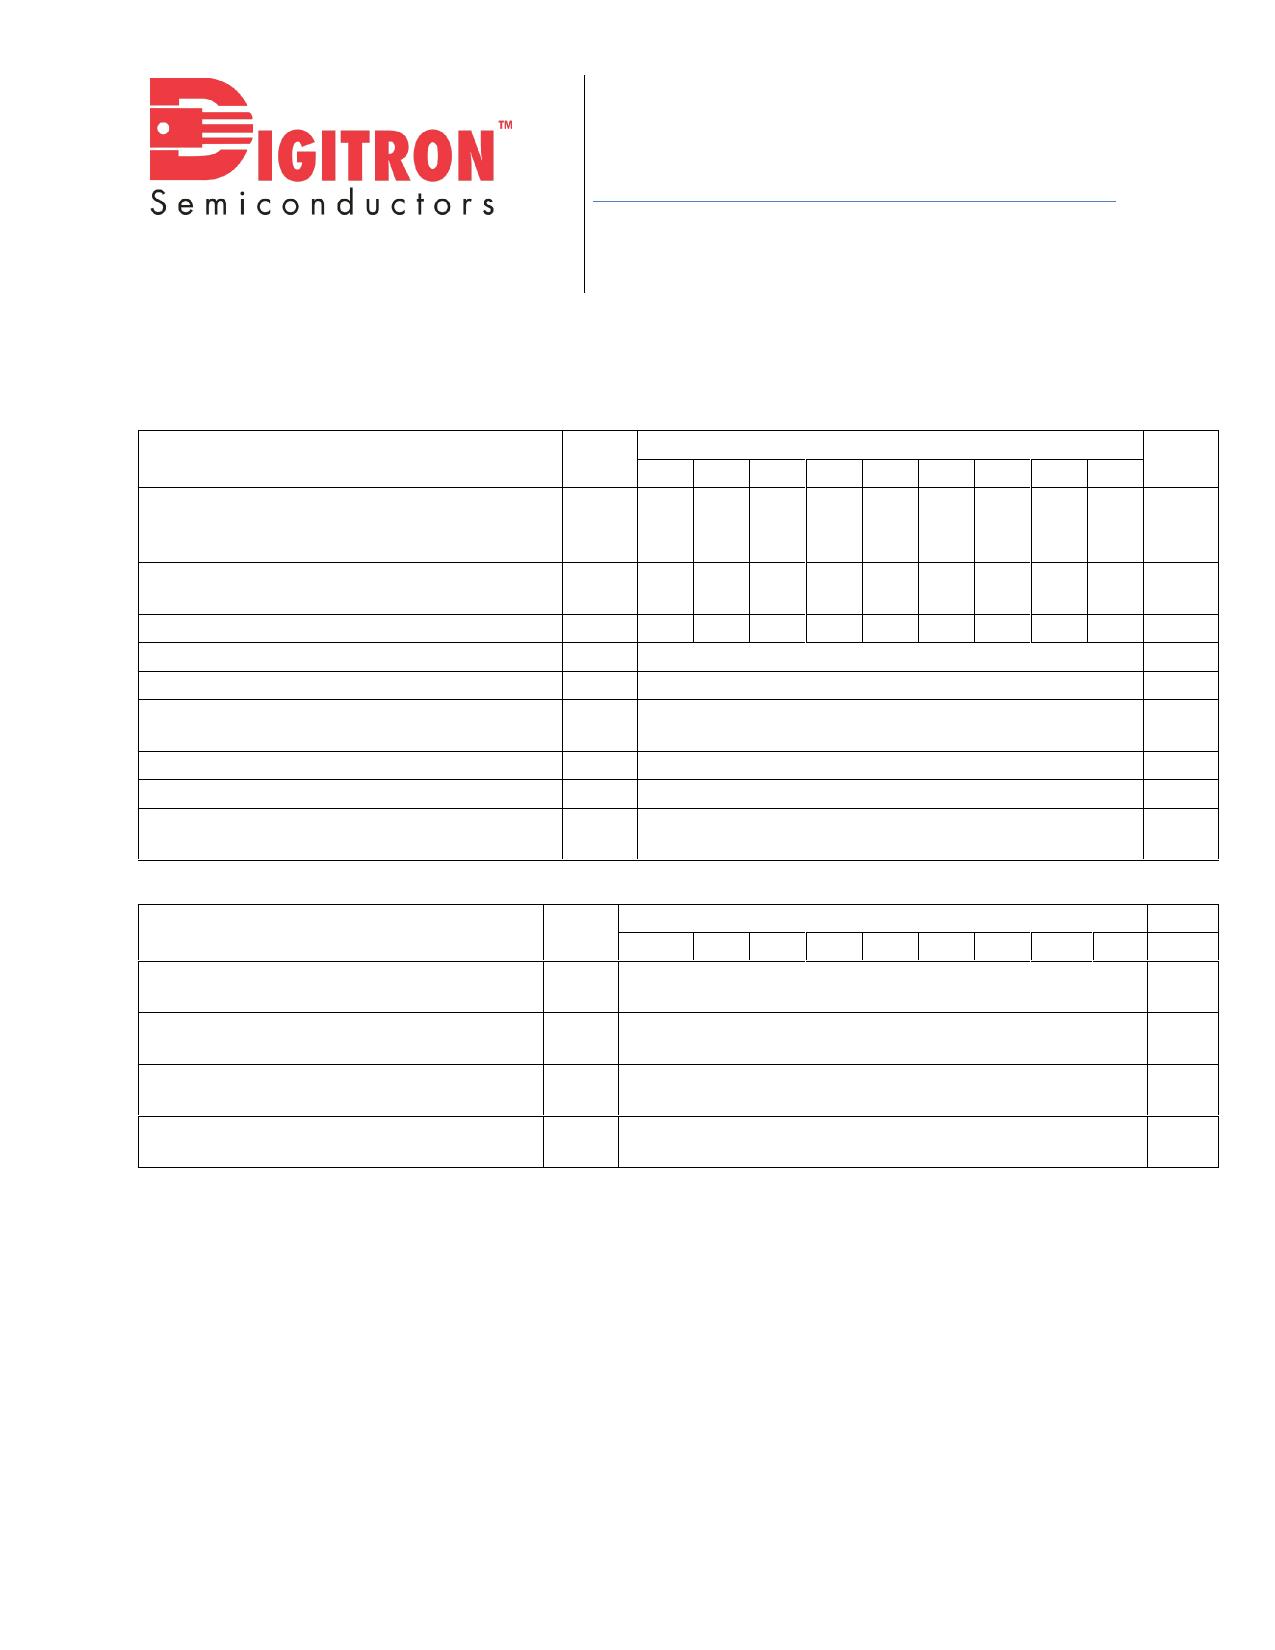 MR1120 데이터시트 및 MR1120 PDF